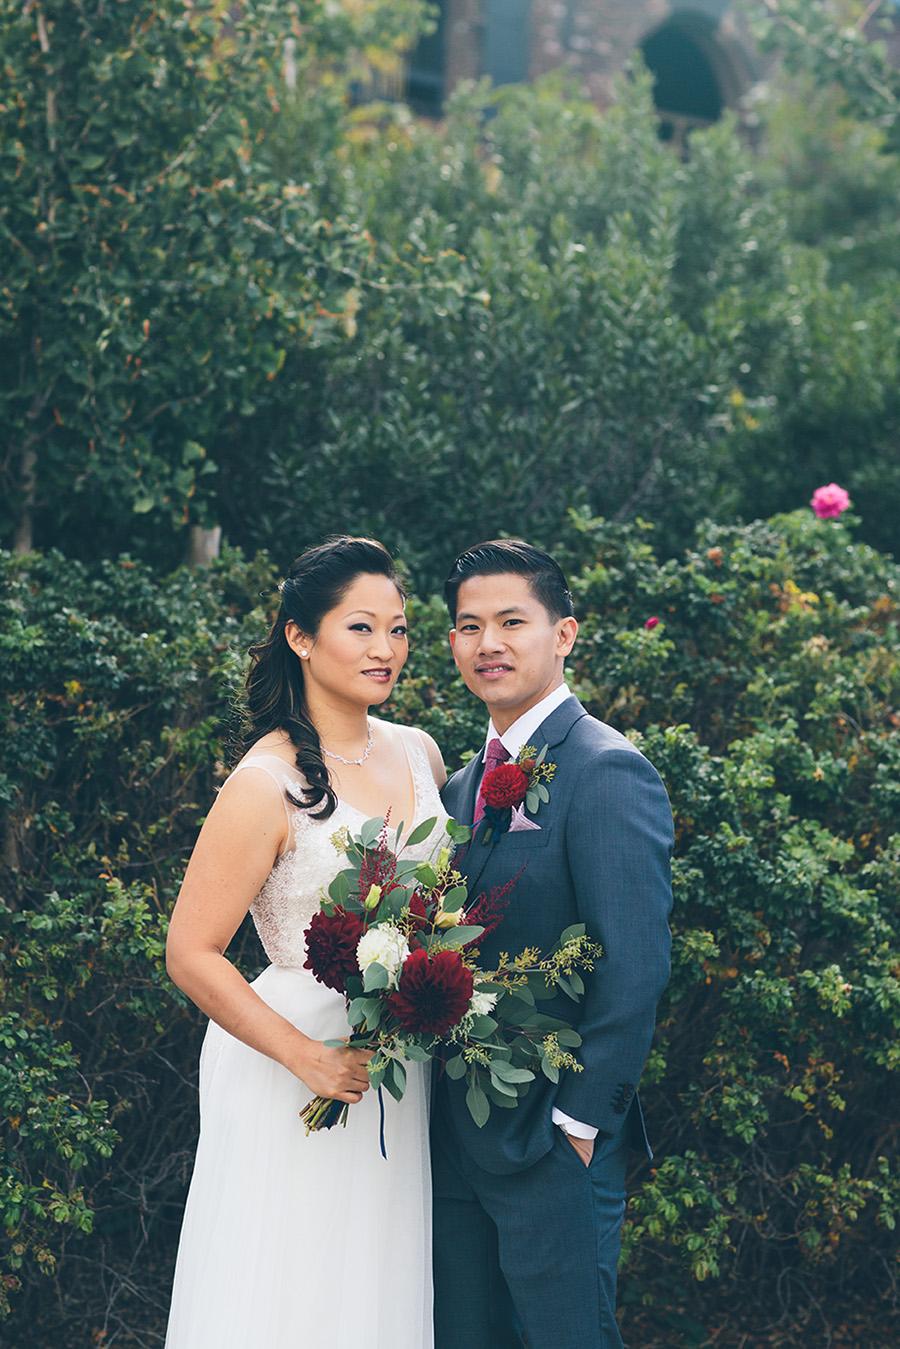 CHRISTINA-BRANDON-BROOKLYN-WEDDING-BRIDEGROOM-CYNTHIACHUNG-0095.jpg